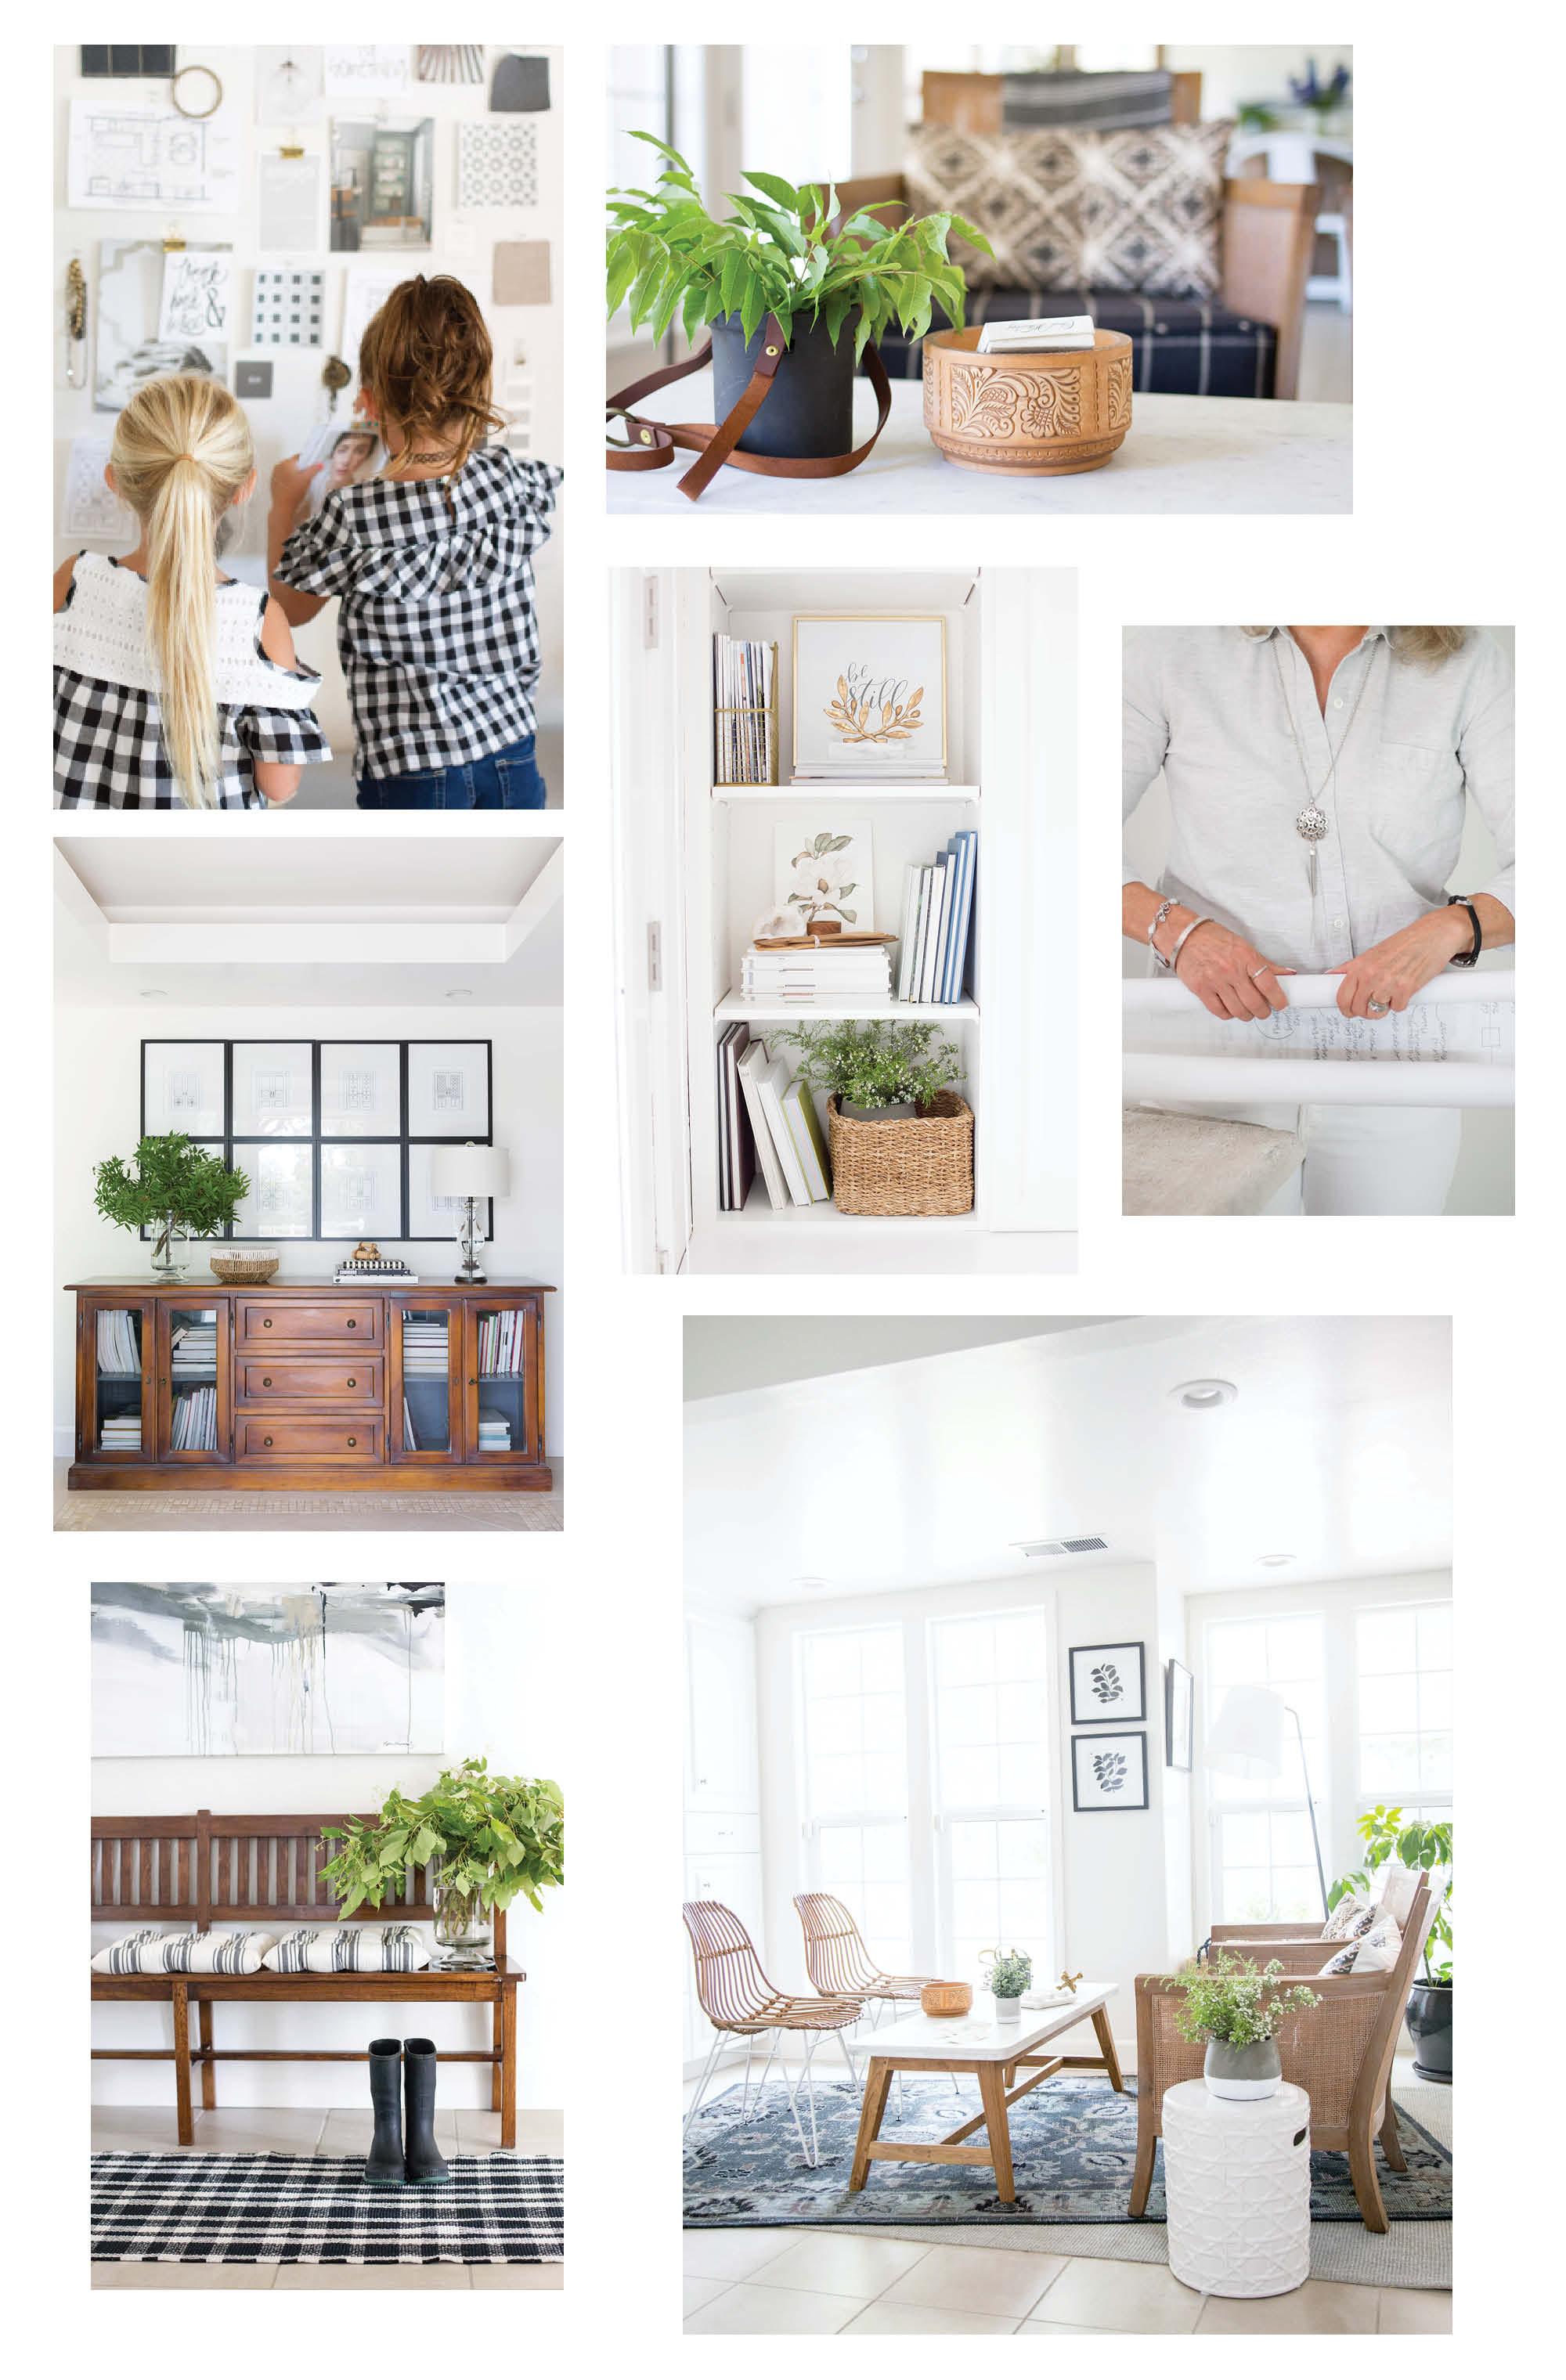 About Tami Faulkner Design Studio - collage of interior design projects .jpg